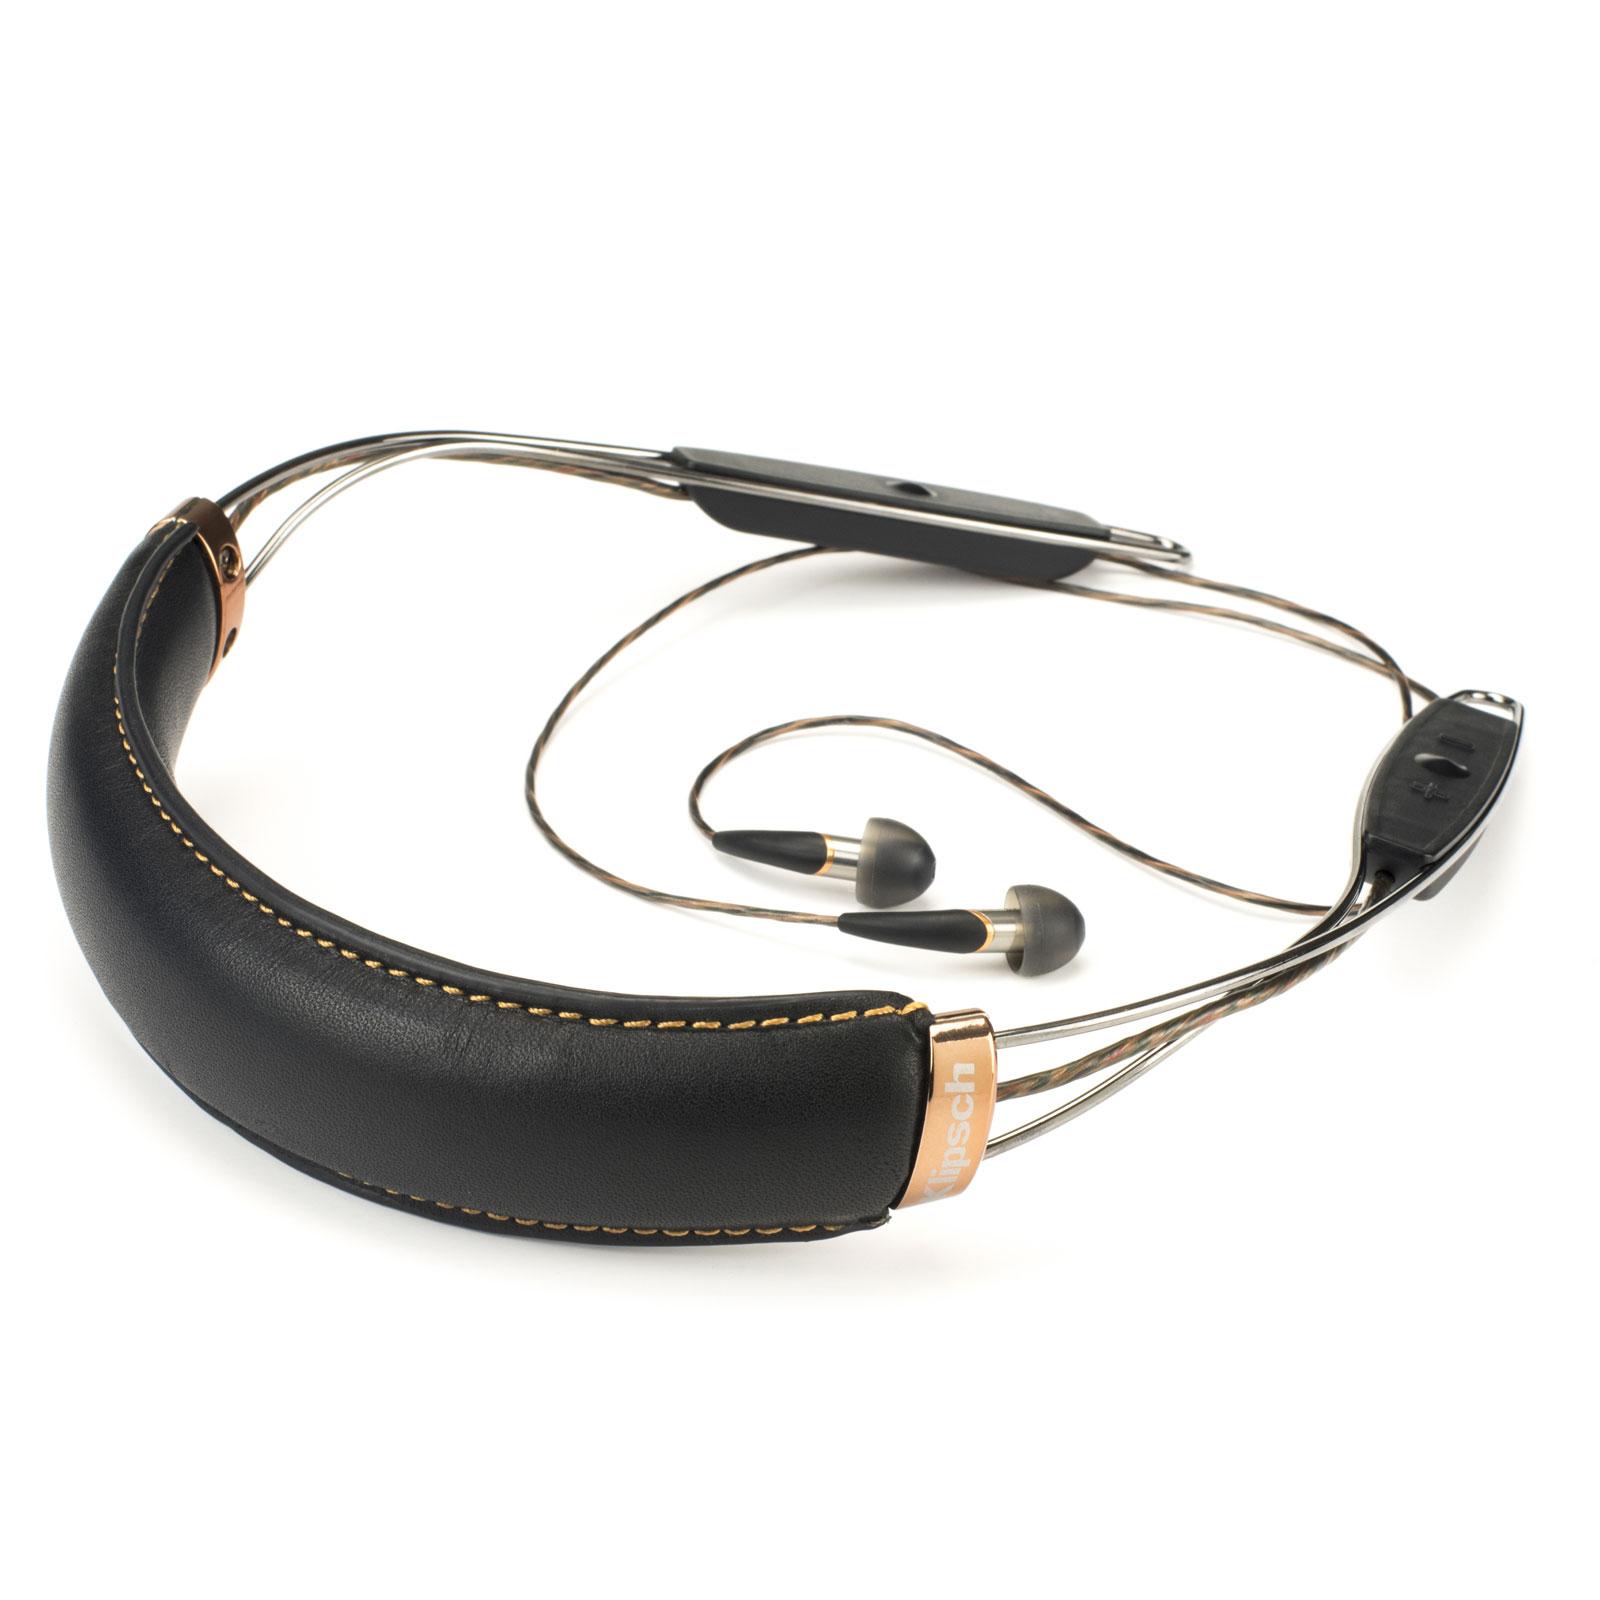 Ecouteurs intra-auriculaires Klipsch X12 Neckband - Compatible Apple